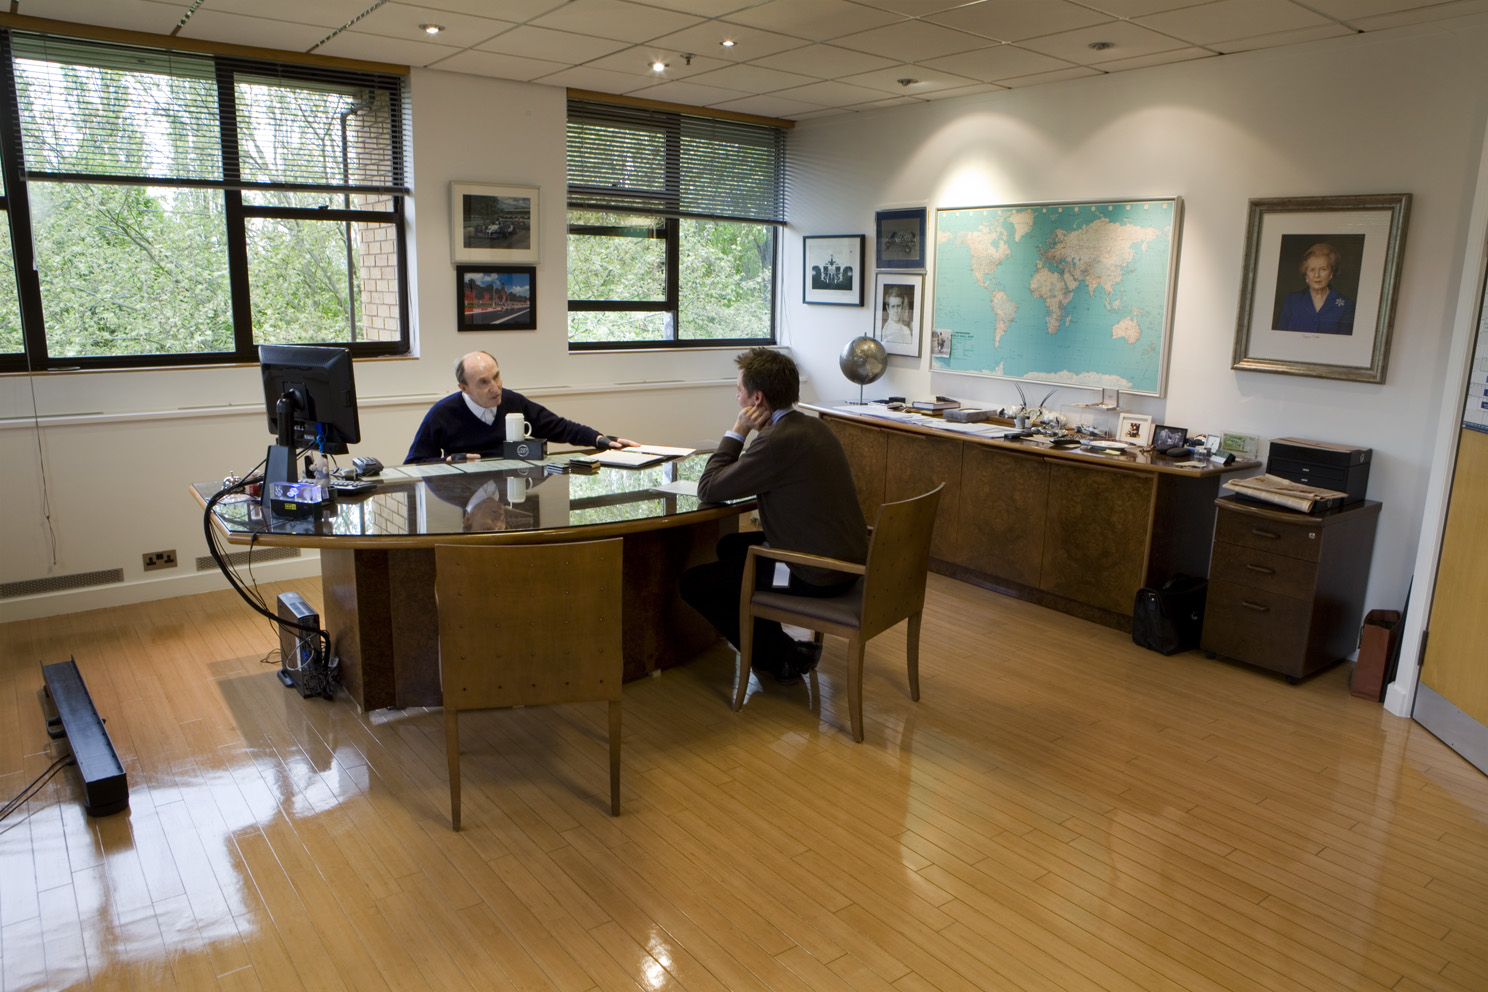 Sir Frank Williams team principal of the Williams Formula One team with Tom Clarkson of Car magazine